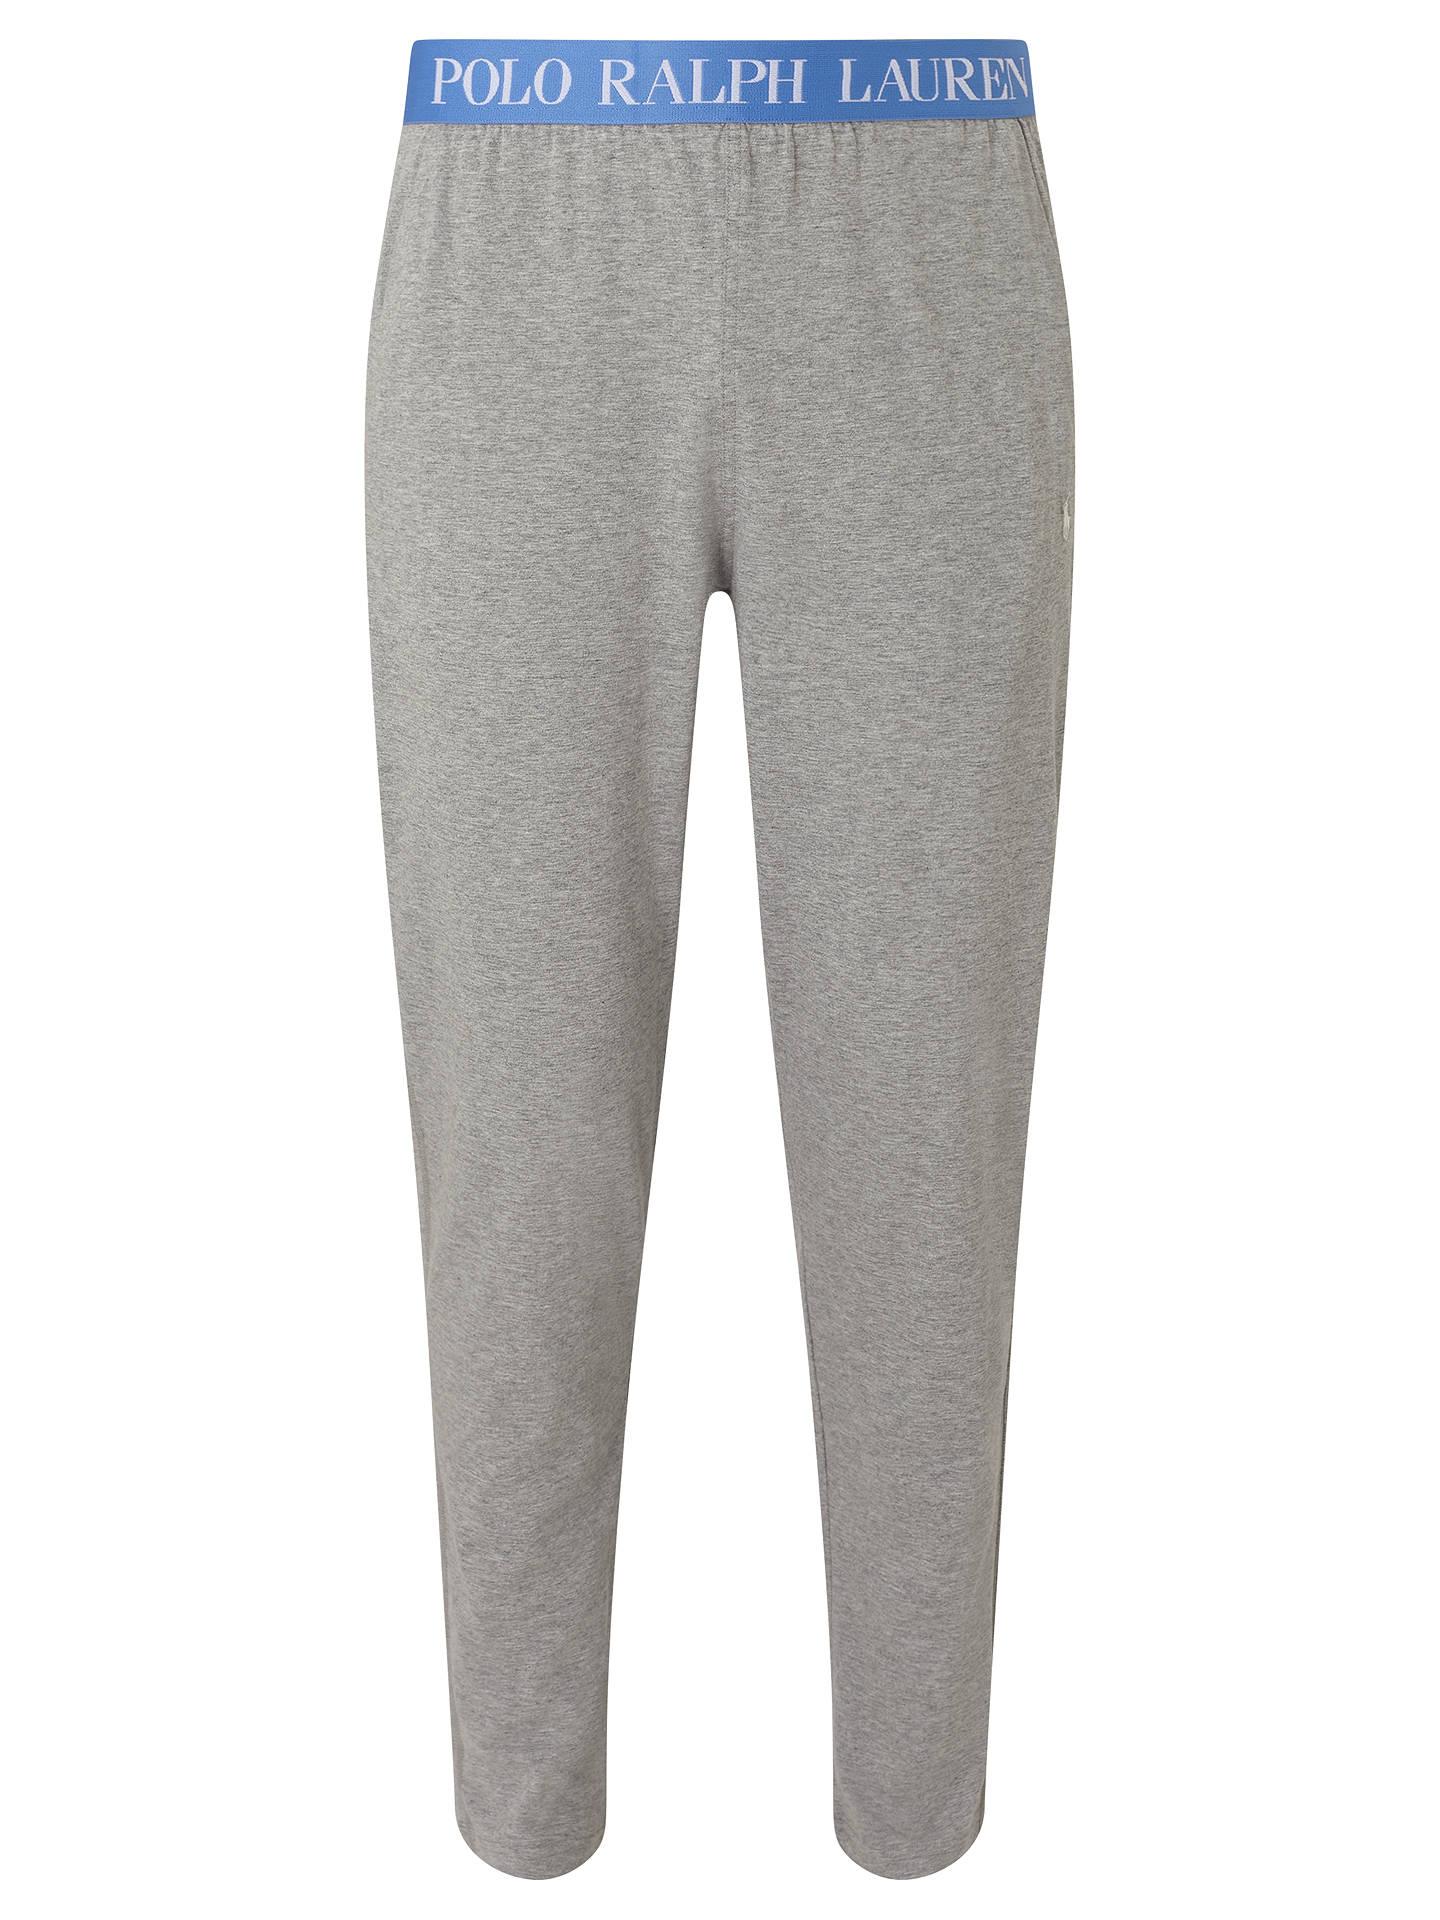 Polo Ralph Lauren Cotton Jersey Lounge Pants Grey At John Lewis